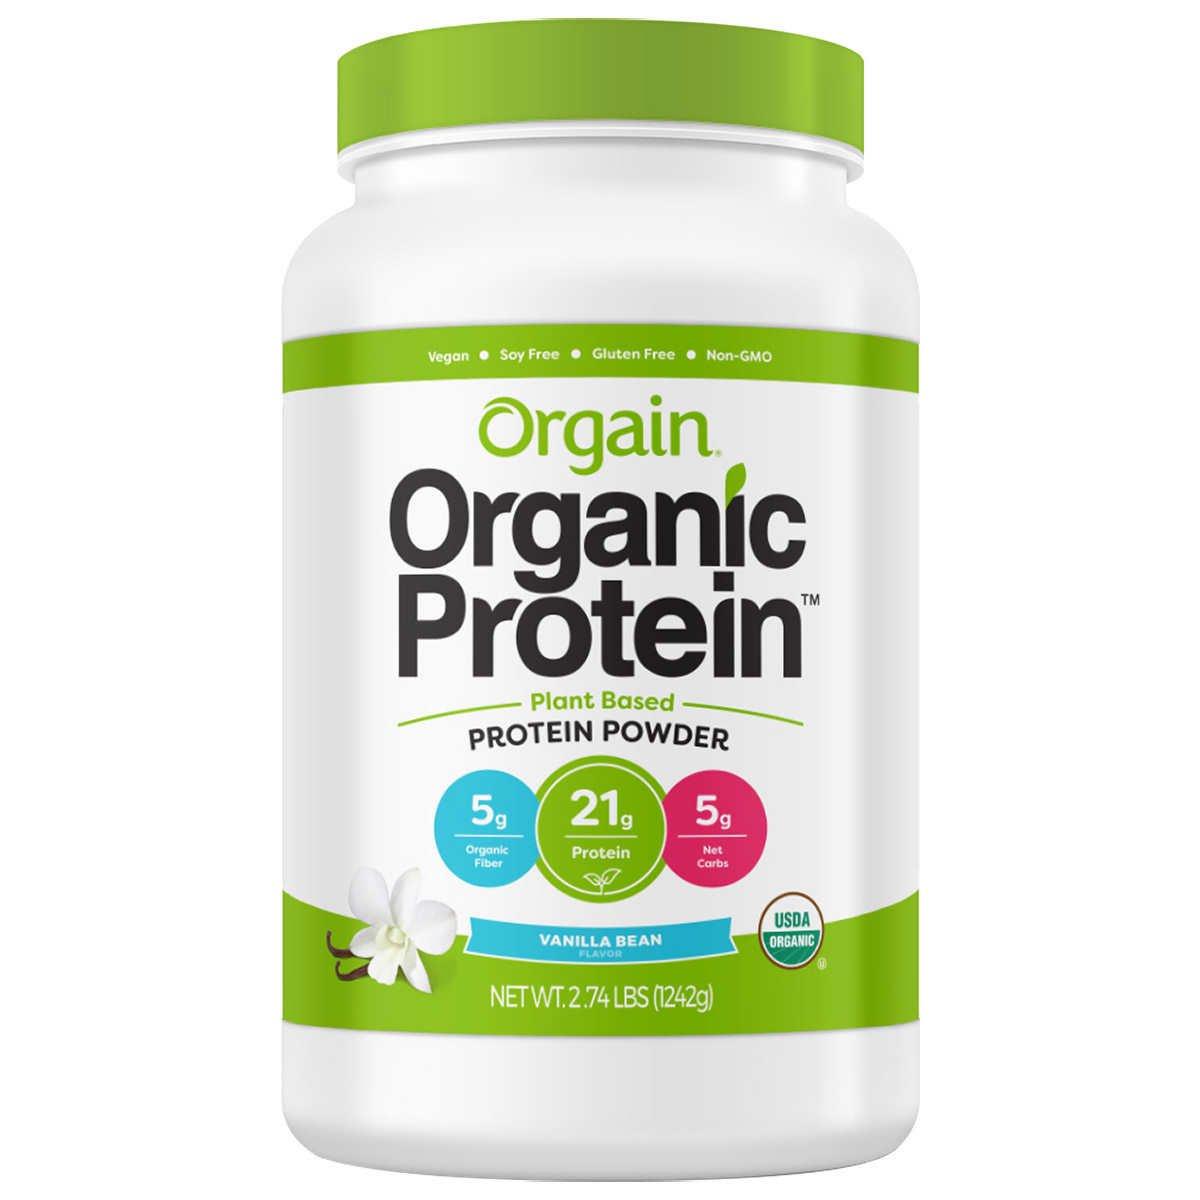 Orgain Organic Plant Based Protein Powder, Vegan, Non-GMO, Gluten Free, 2.03 Pound, 1 Count, Packaging May Vary (Vanilla Bean, 2.74 Pound)